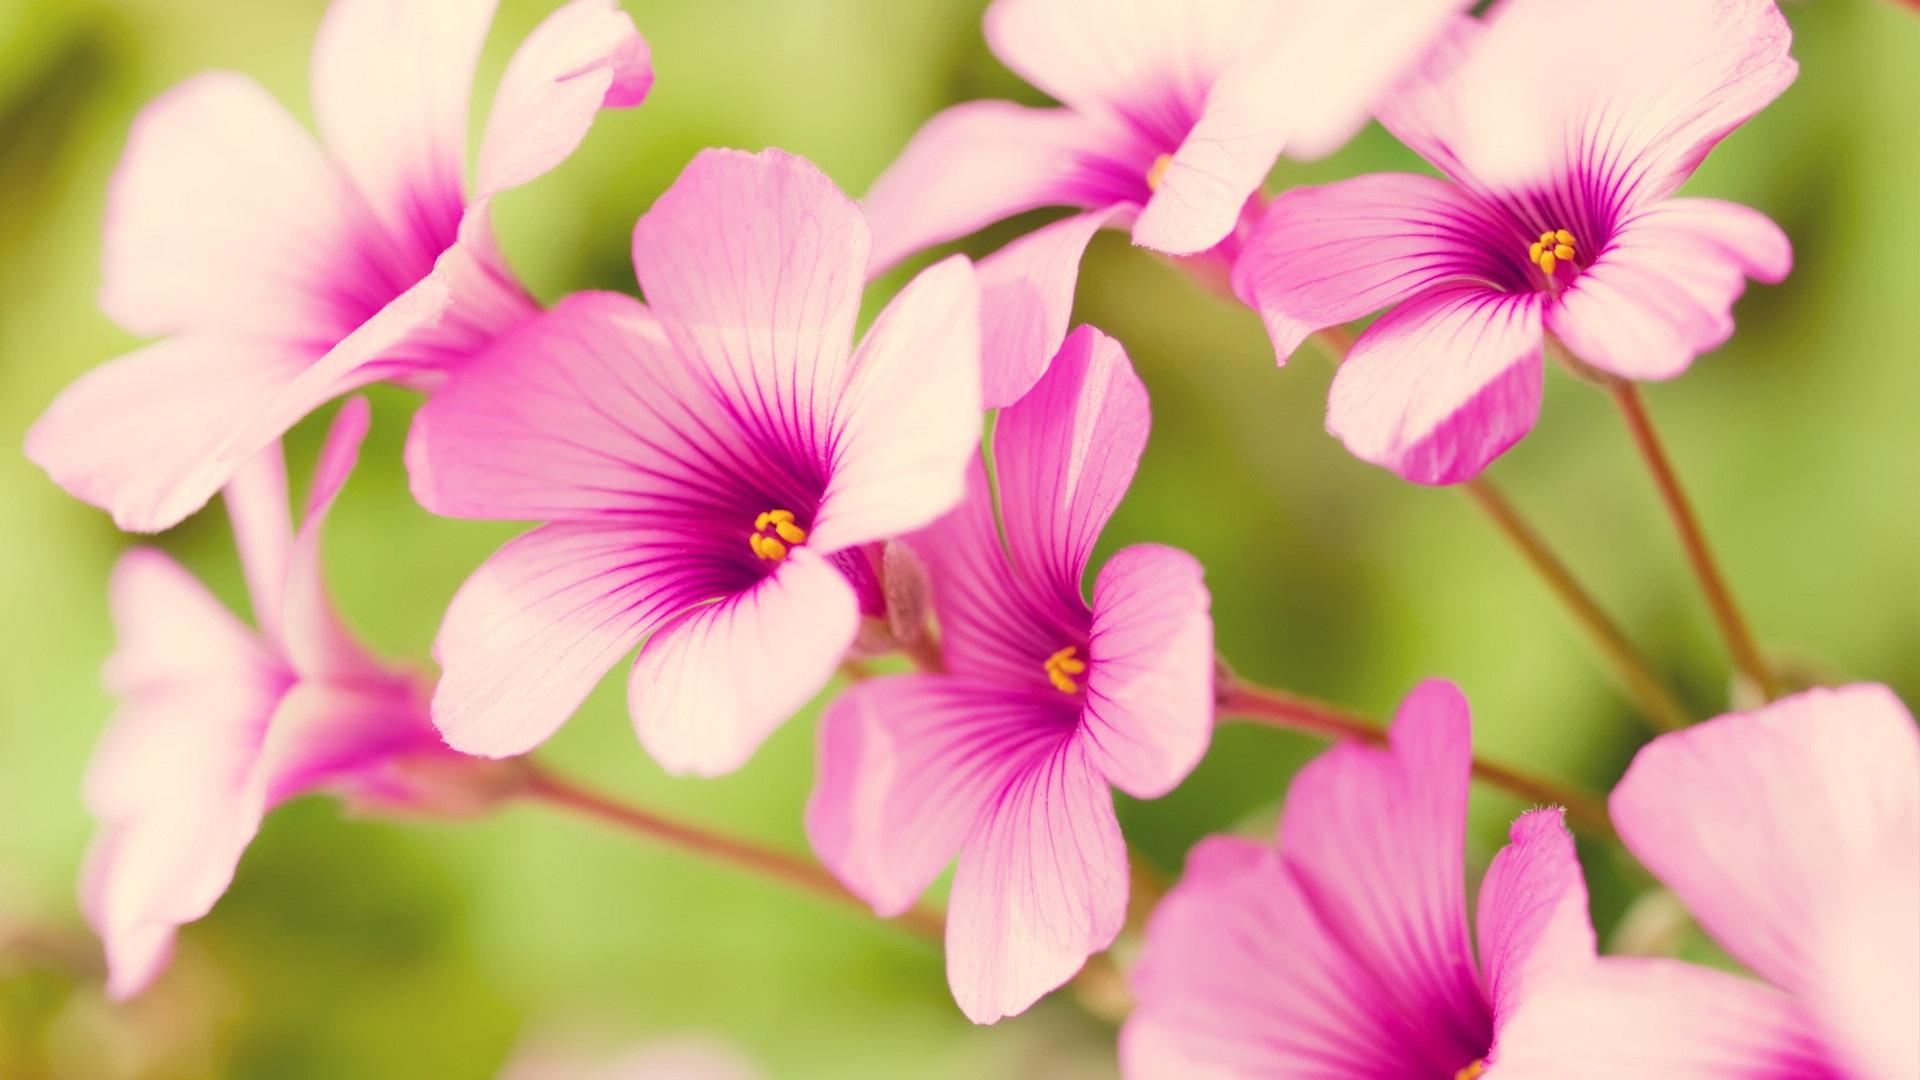 Spring flower screensavers hd desktop wallpapers 4k hd spring flower screensavers mightylinksfo